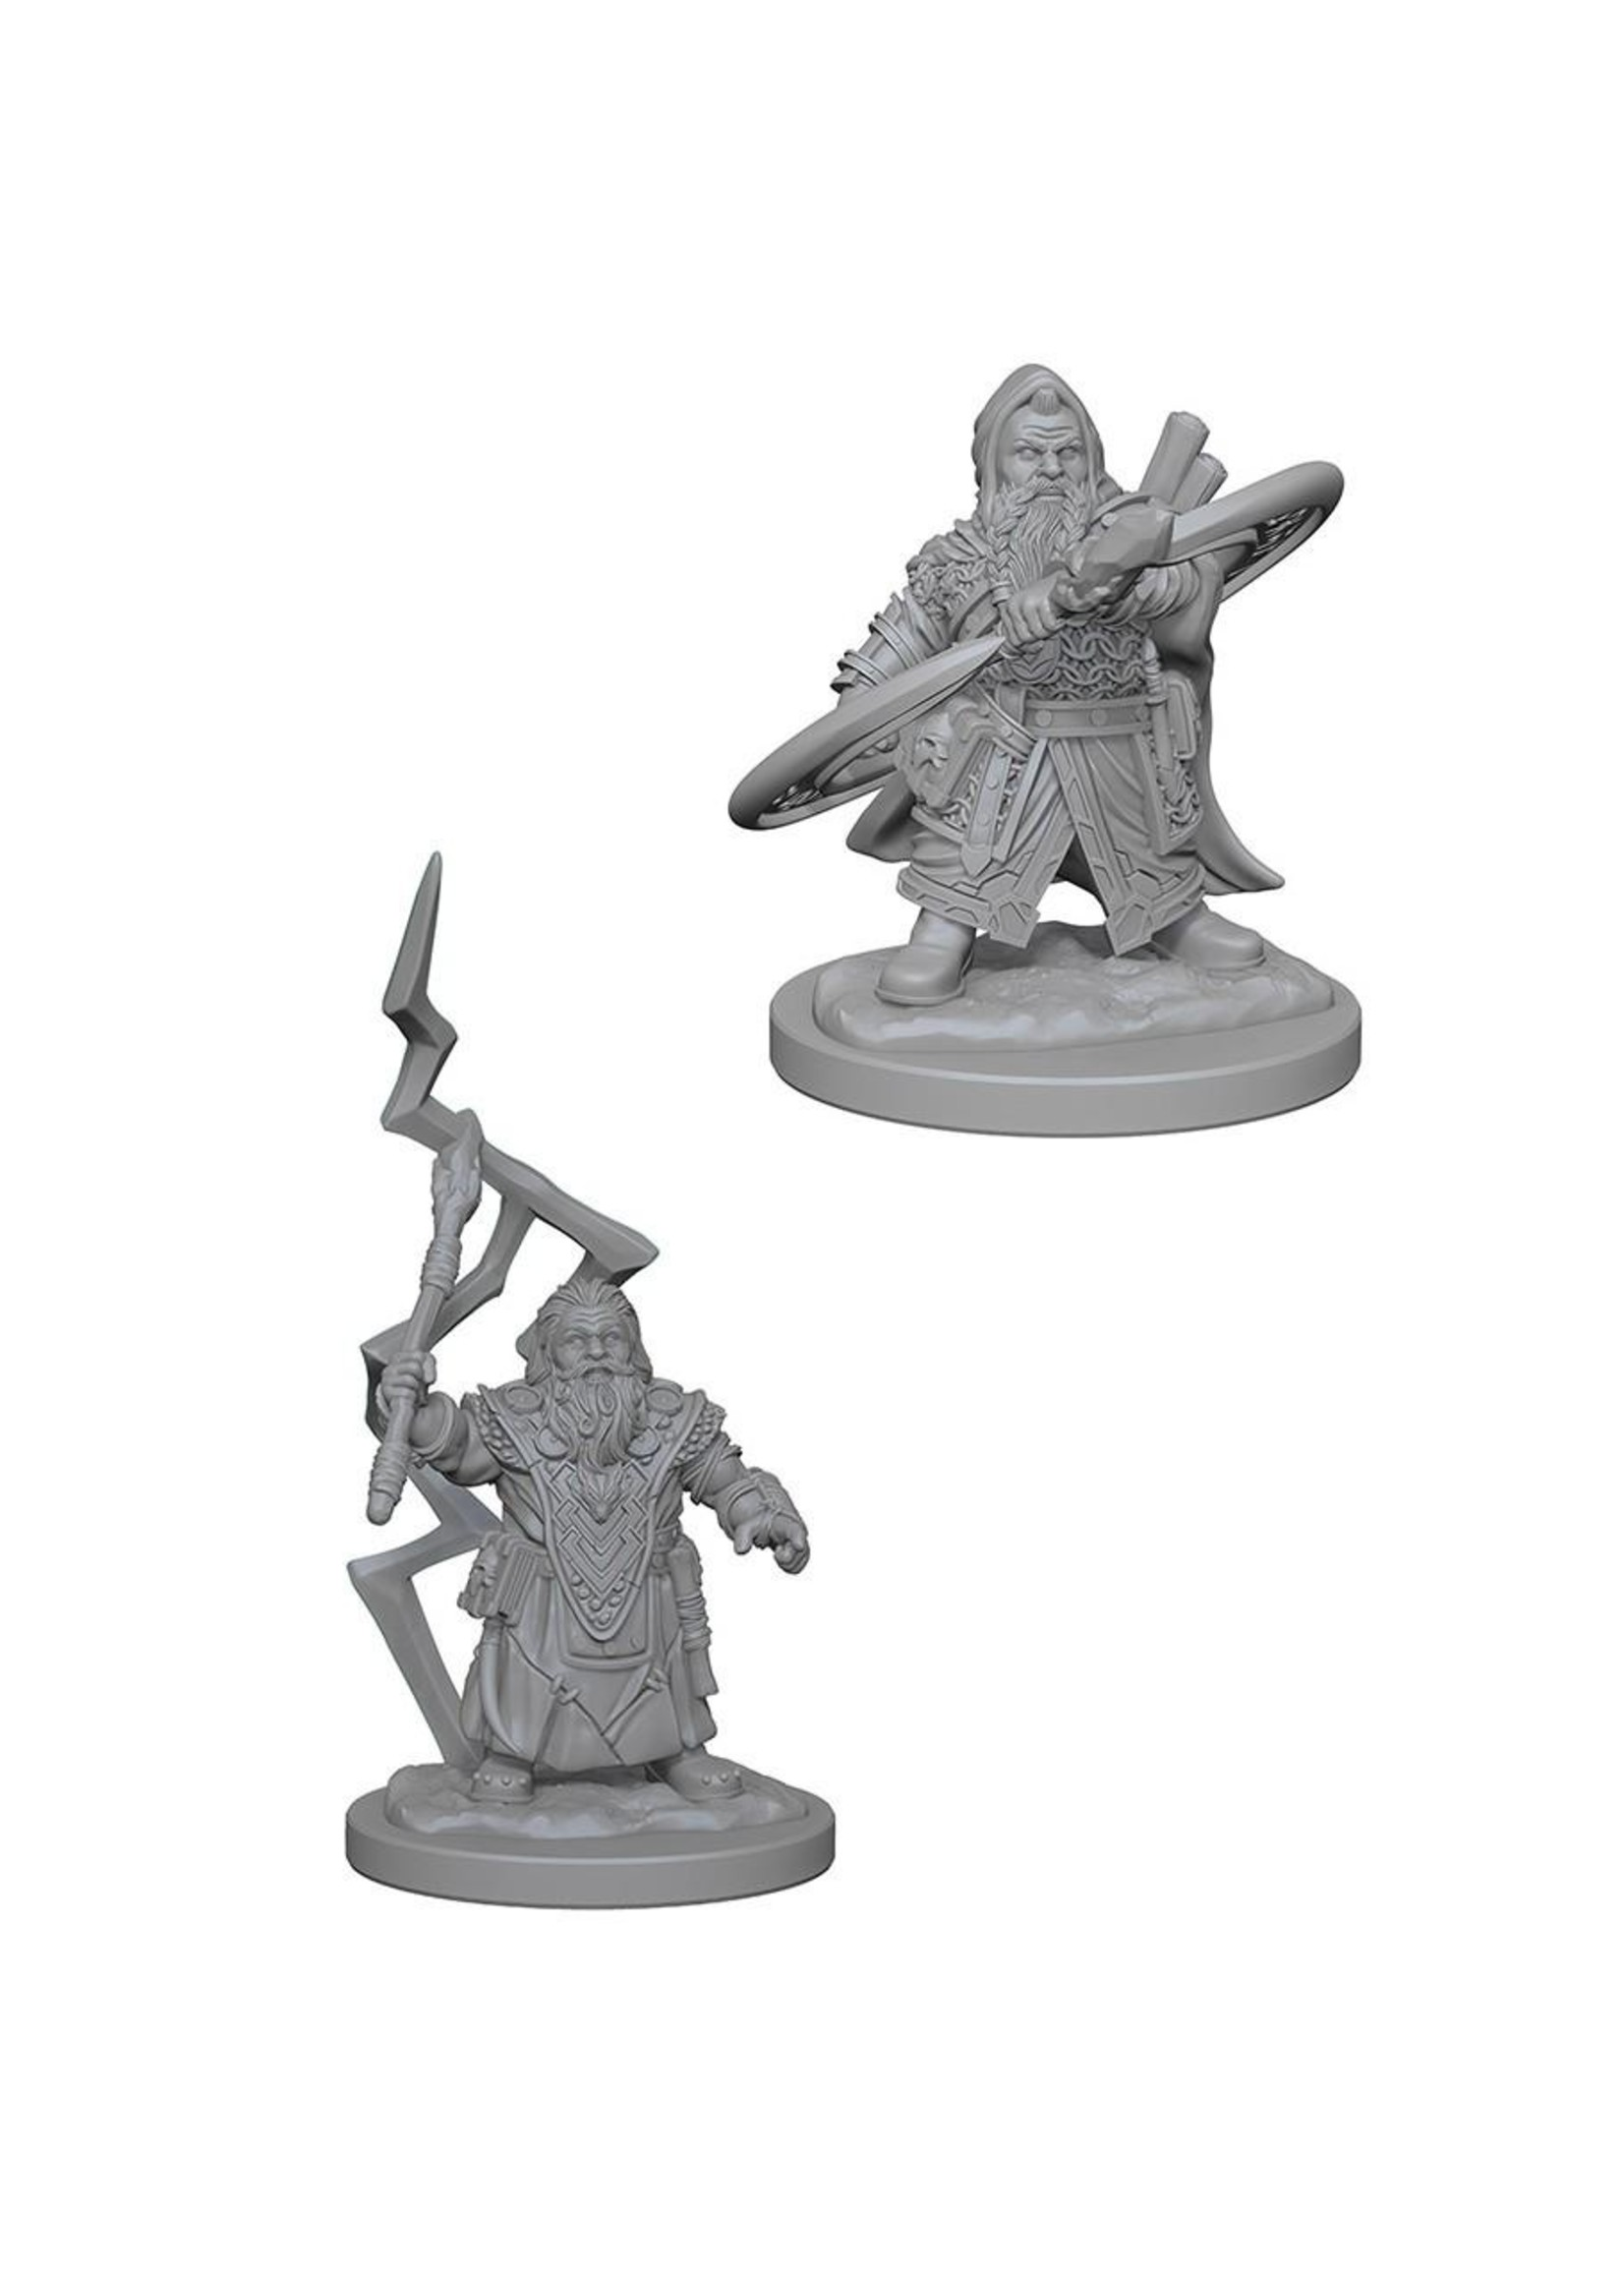 Pathfinder Deep Cuts Unpainted Miniatures: W4 Dwarf Male Sorcerer